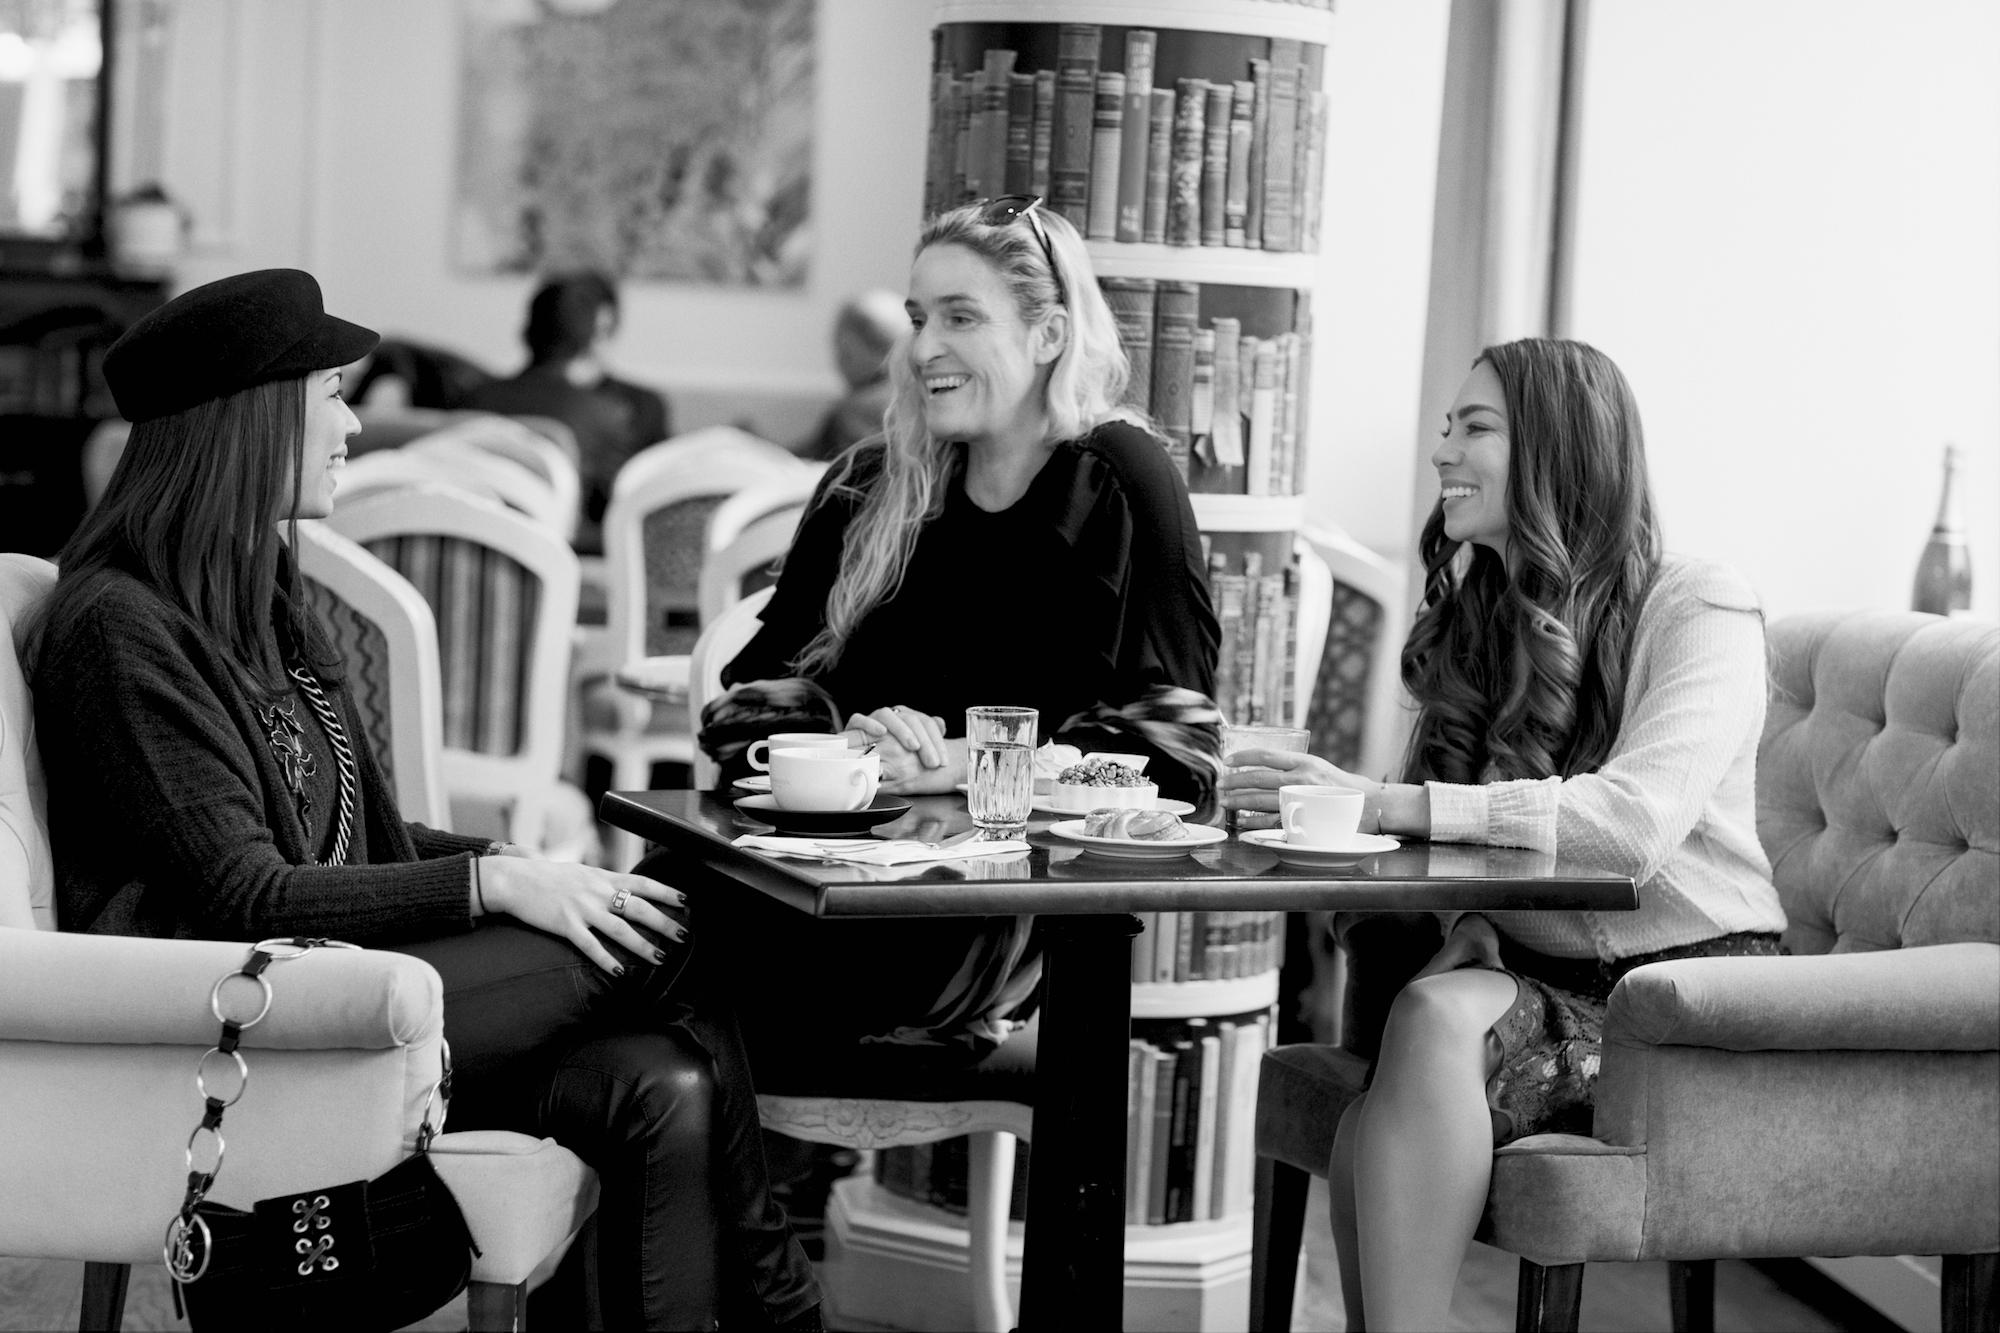 To the left: Caroline Eriksson, Angelina Jolin, and Anna Maria Sandegren